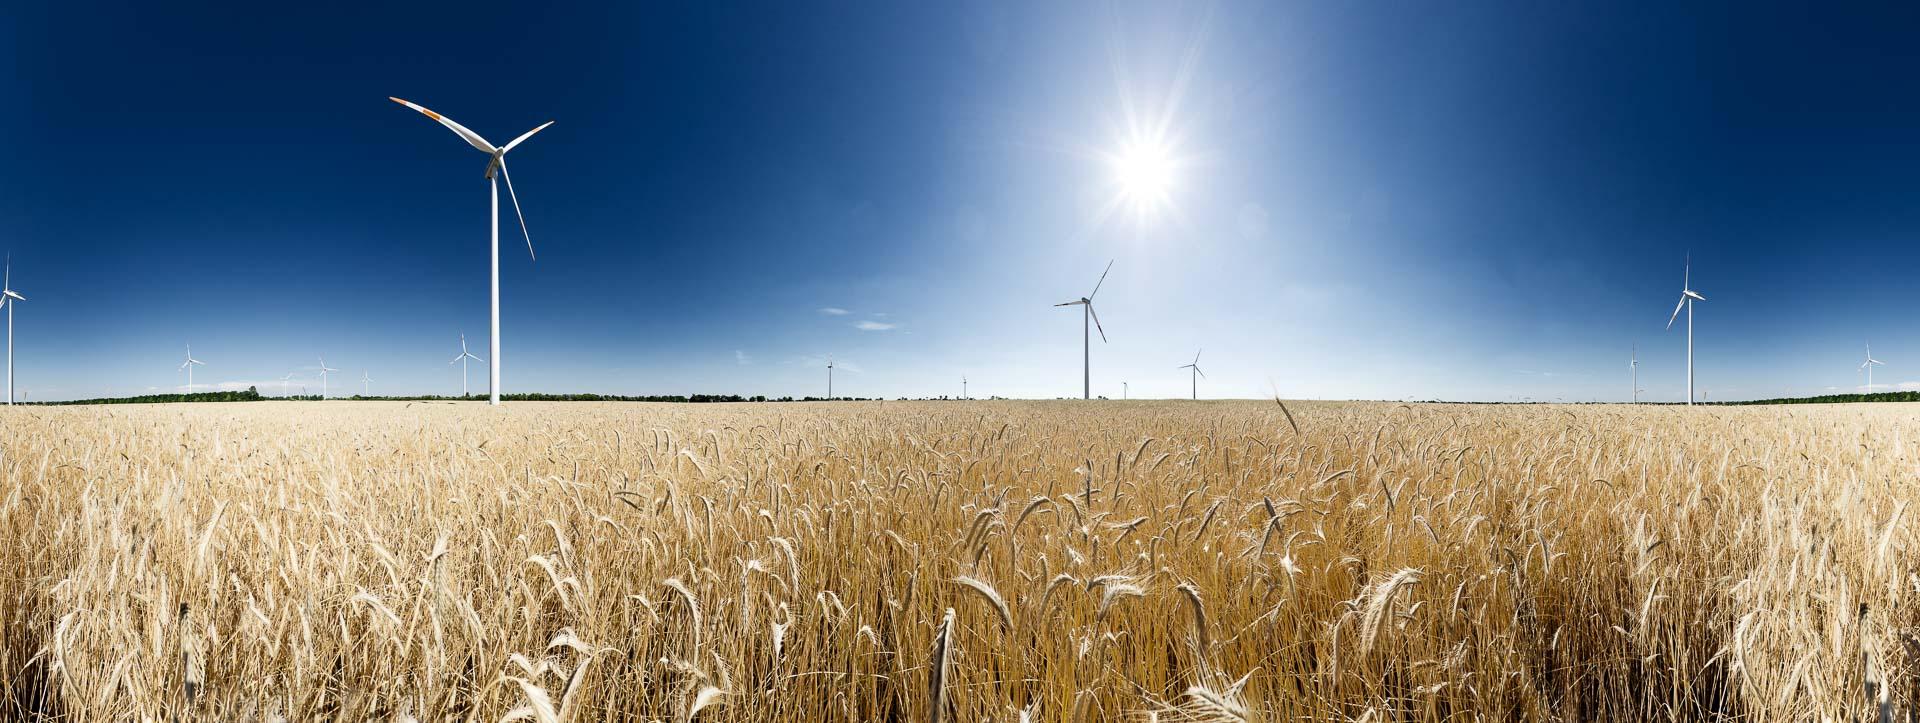 Windenergie Kornfeld – 360° Foto